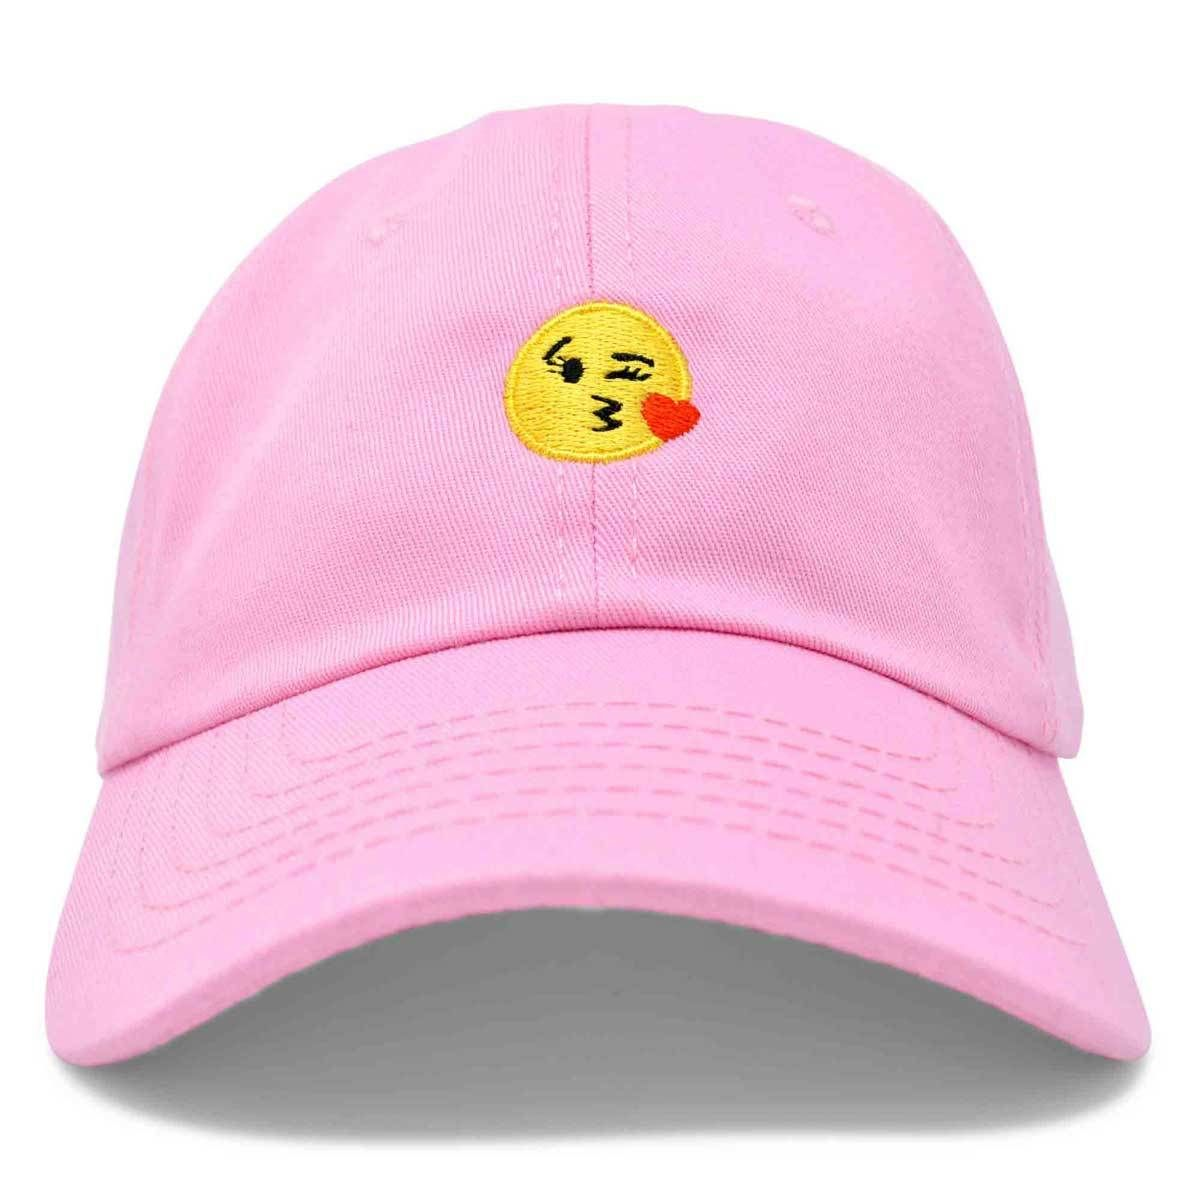 e03a8e38331 DALIX Kiss Emoji Hat Dad Hats Cute Baseball Cap For Women Black White Pink  Beige